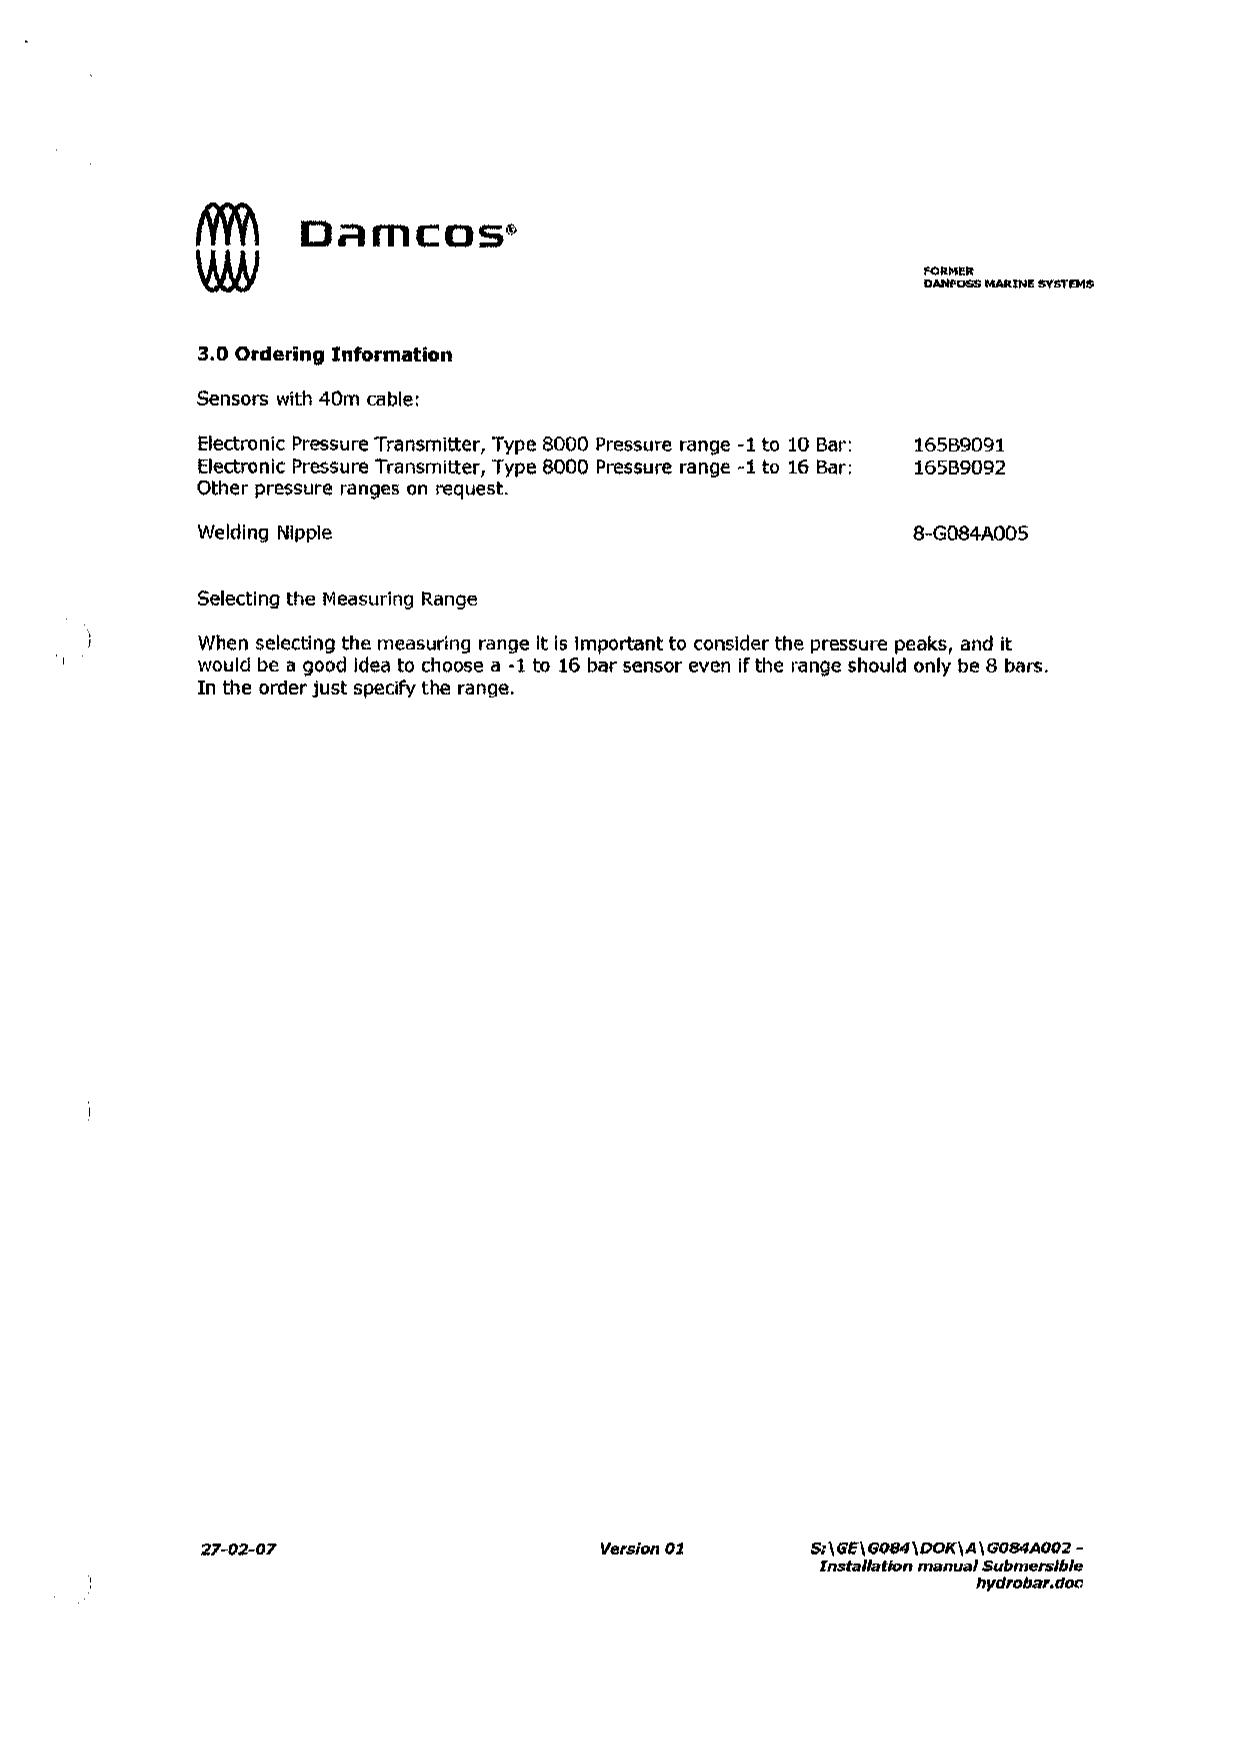 pressure transmitter Data sheet